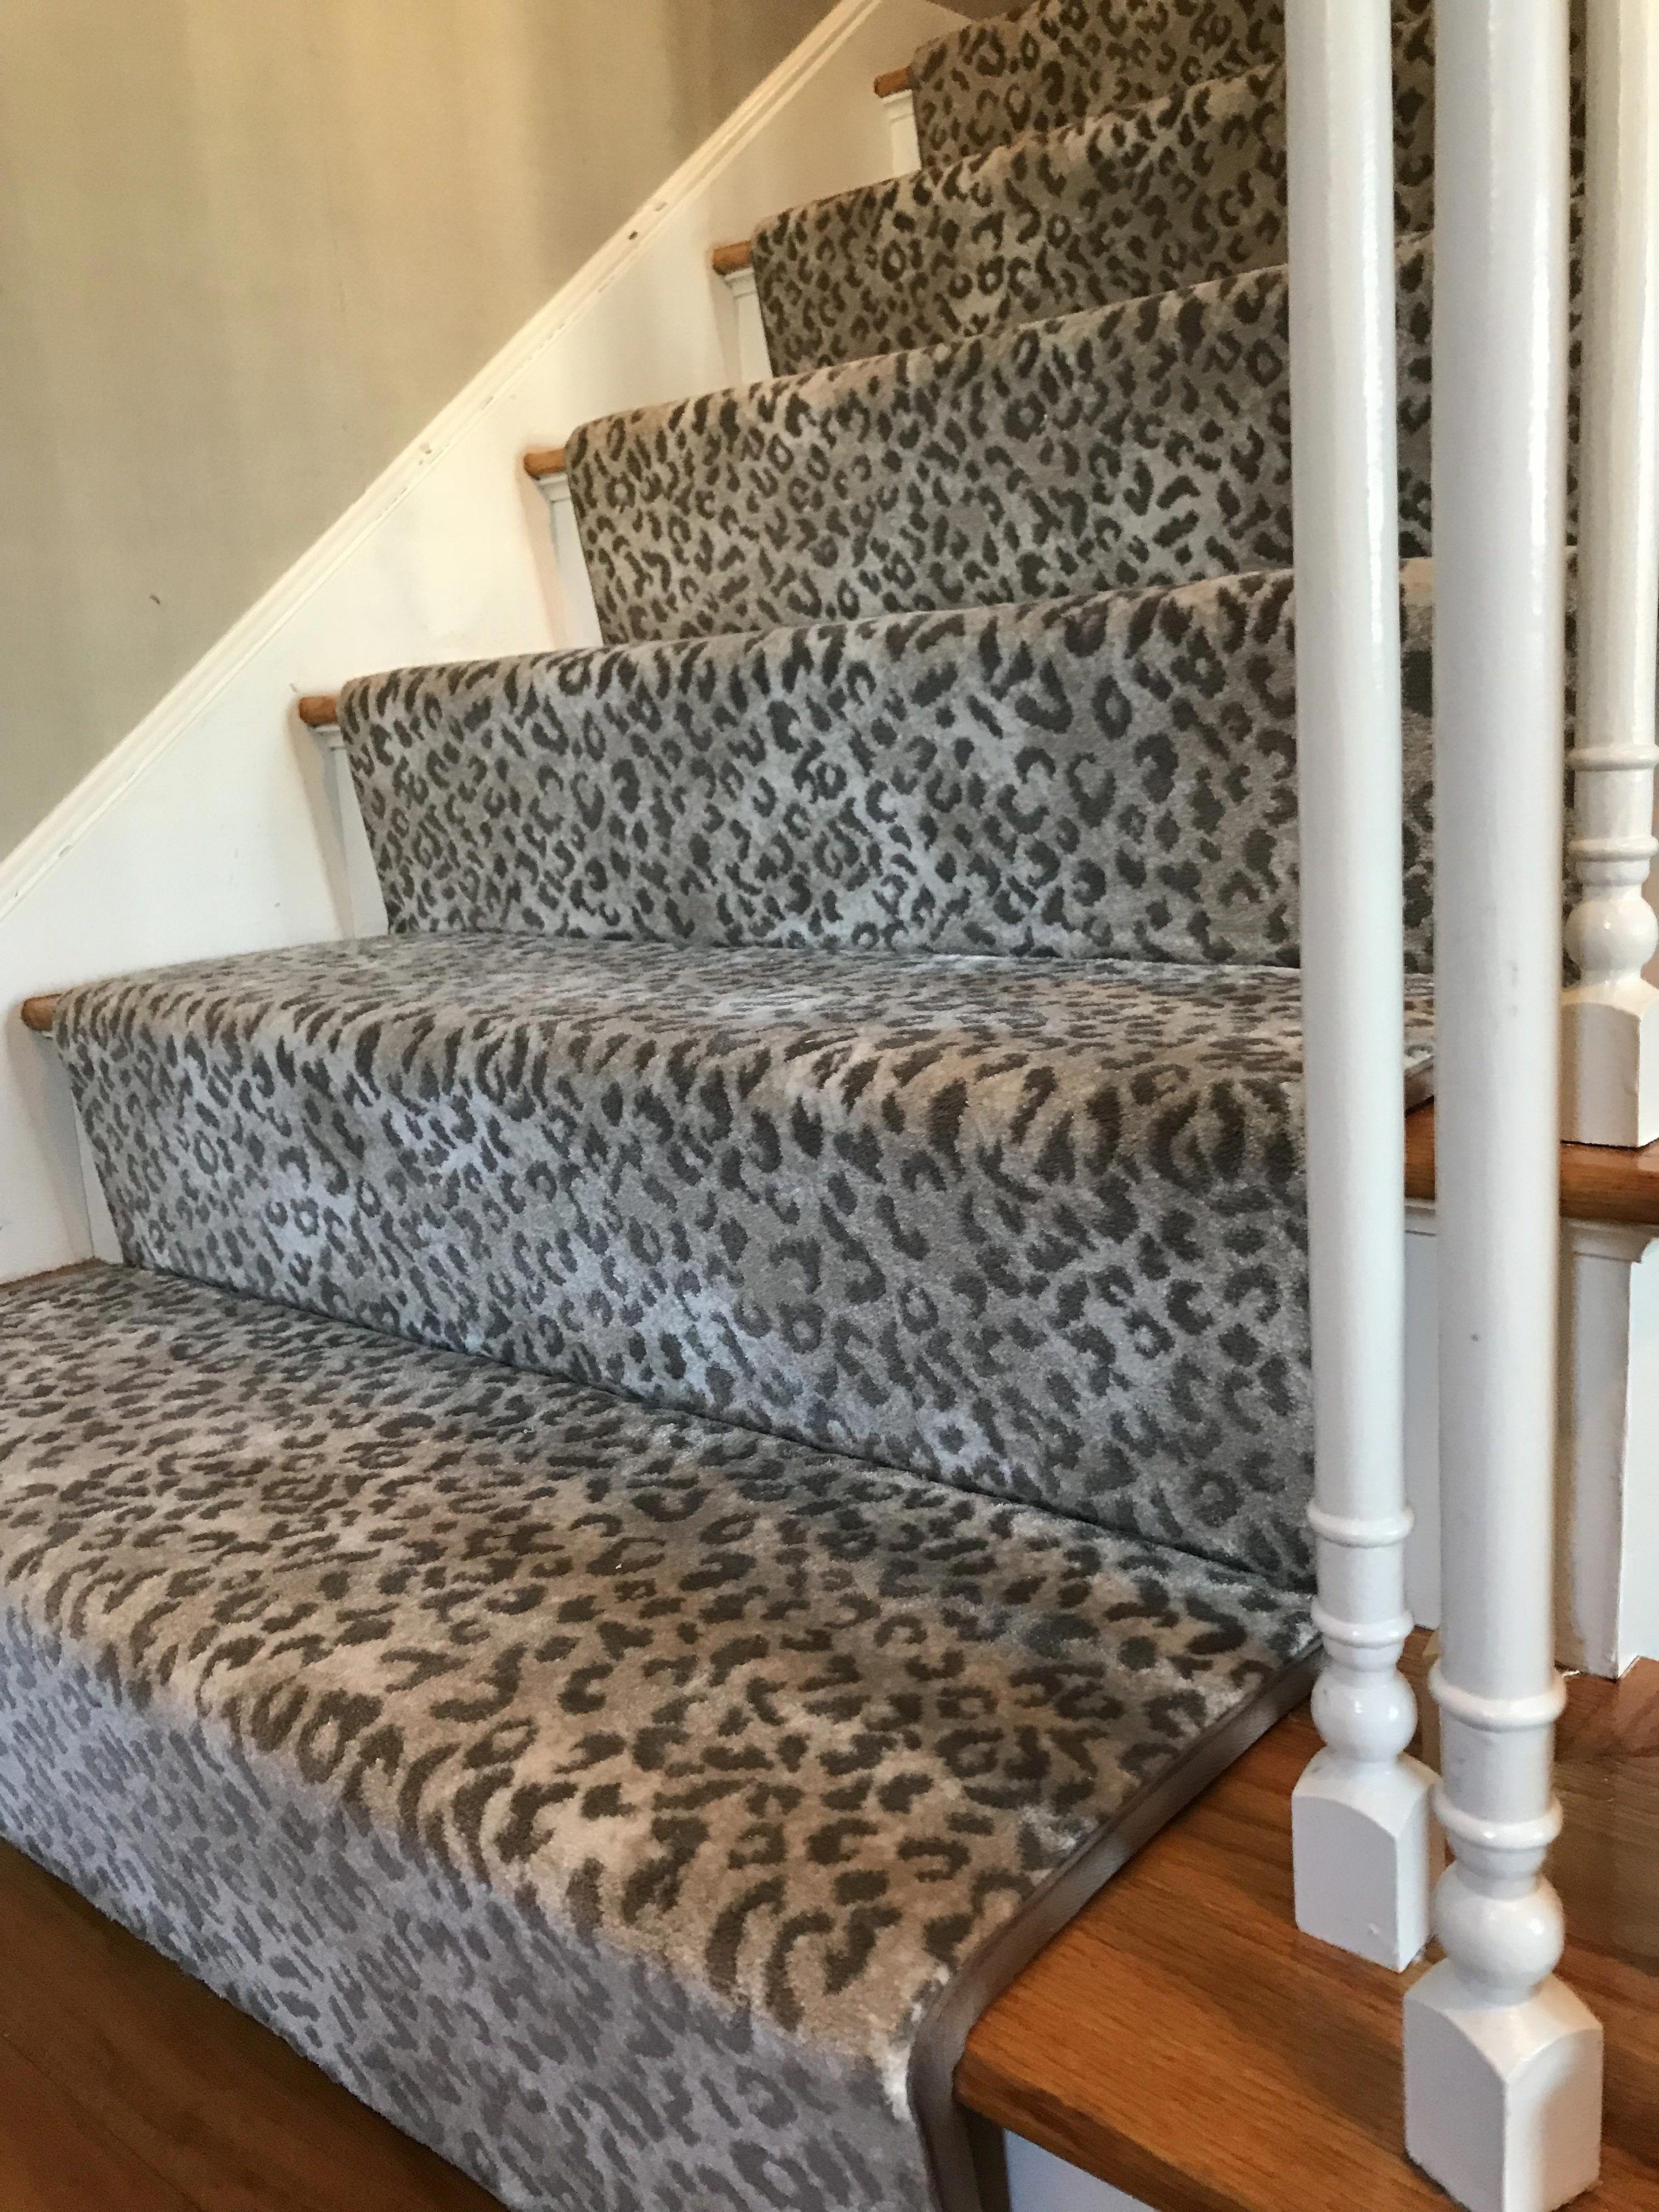 Best Carpet Runners Machine Washable Carpetrunnersforyachts In 400 x 300